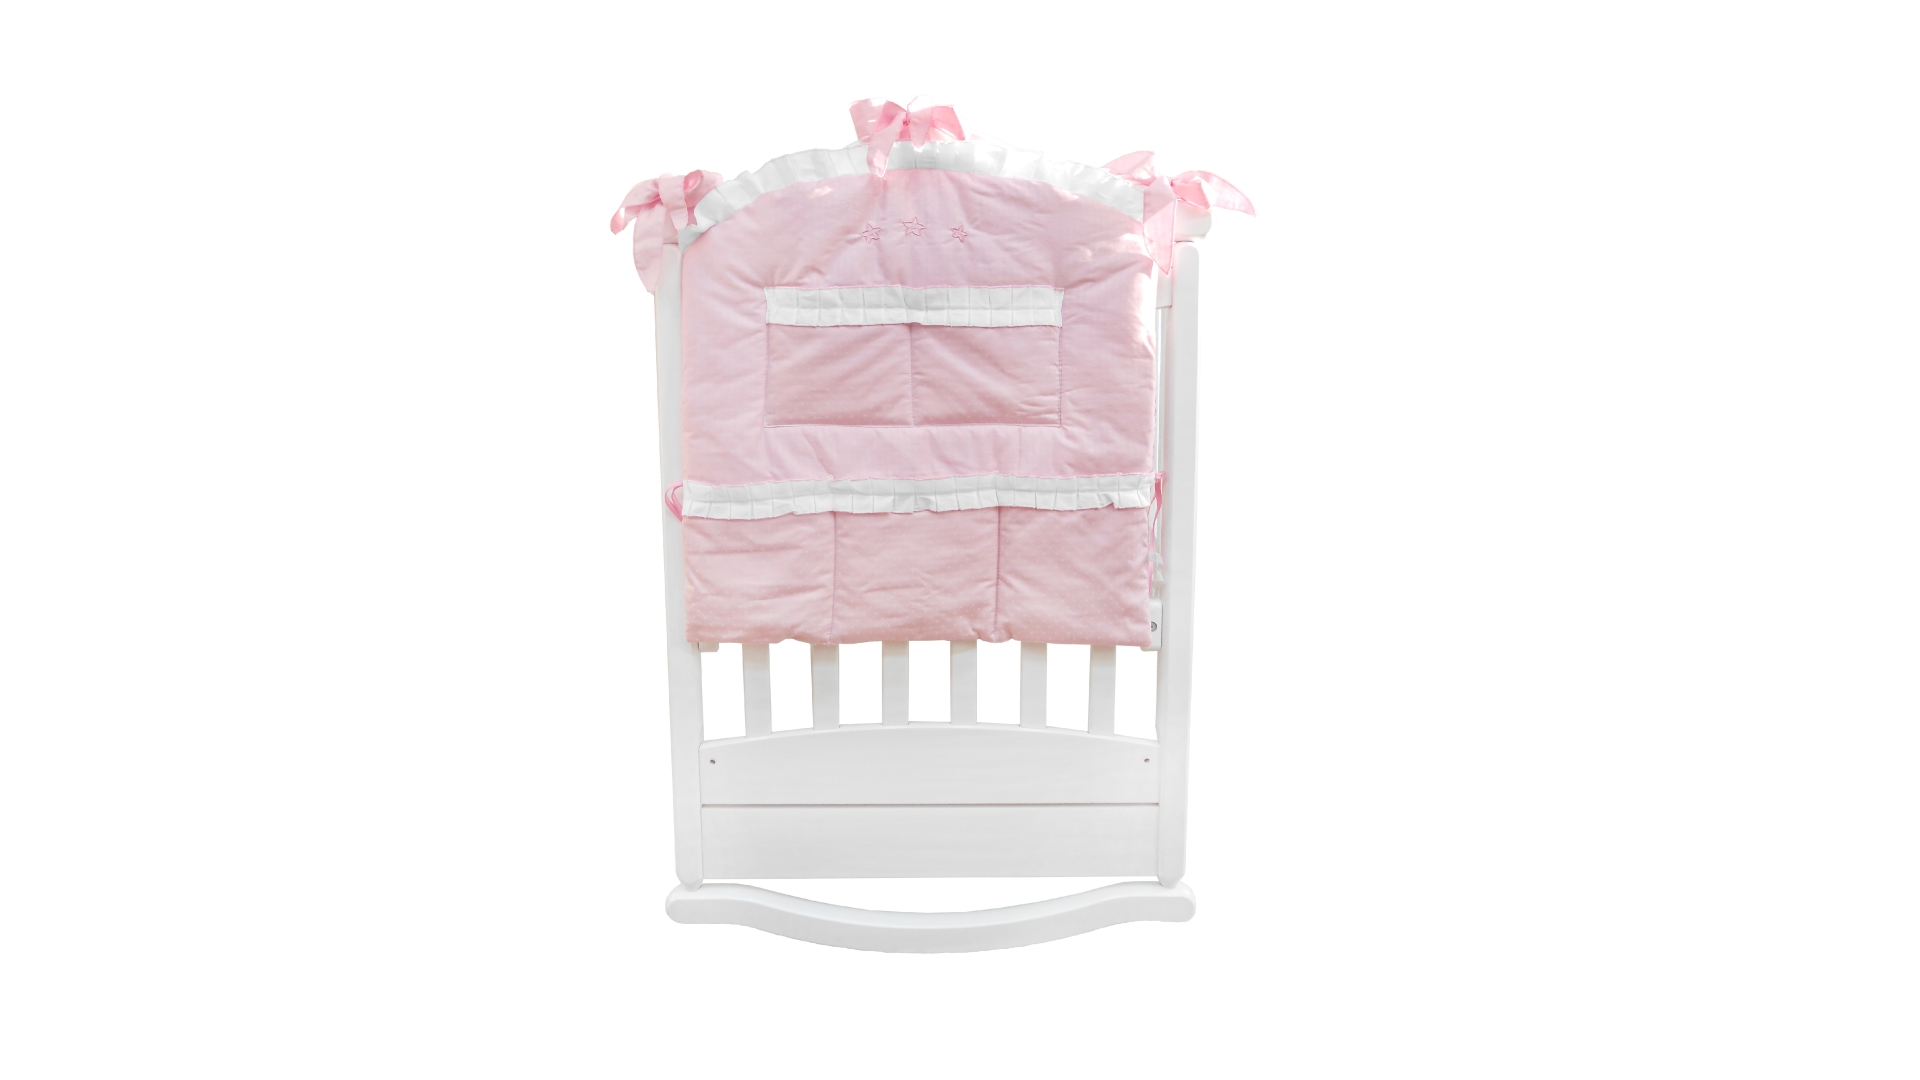 Аксессуар в кроватку Карман Три медведя (розовый) фото FullHD (0)